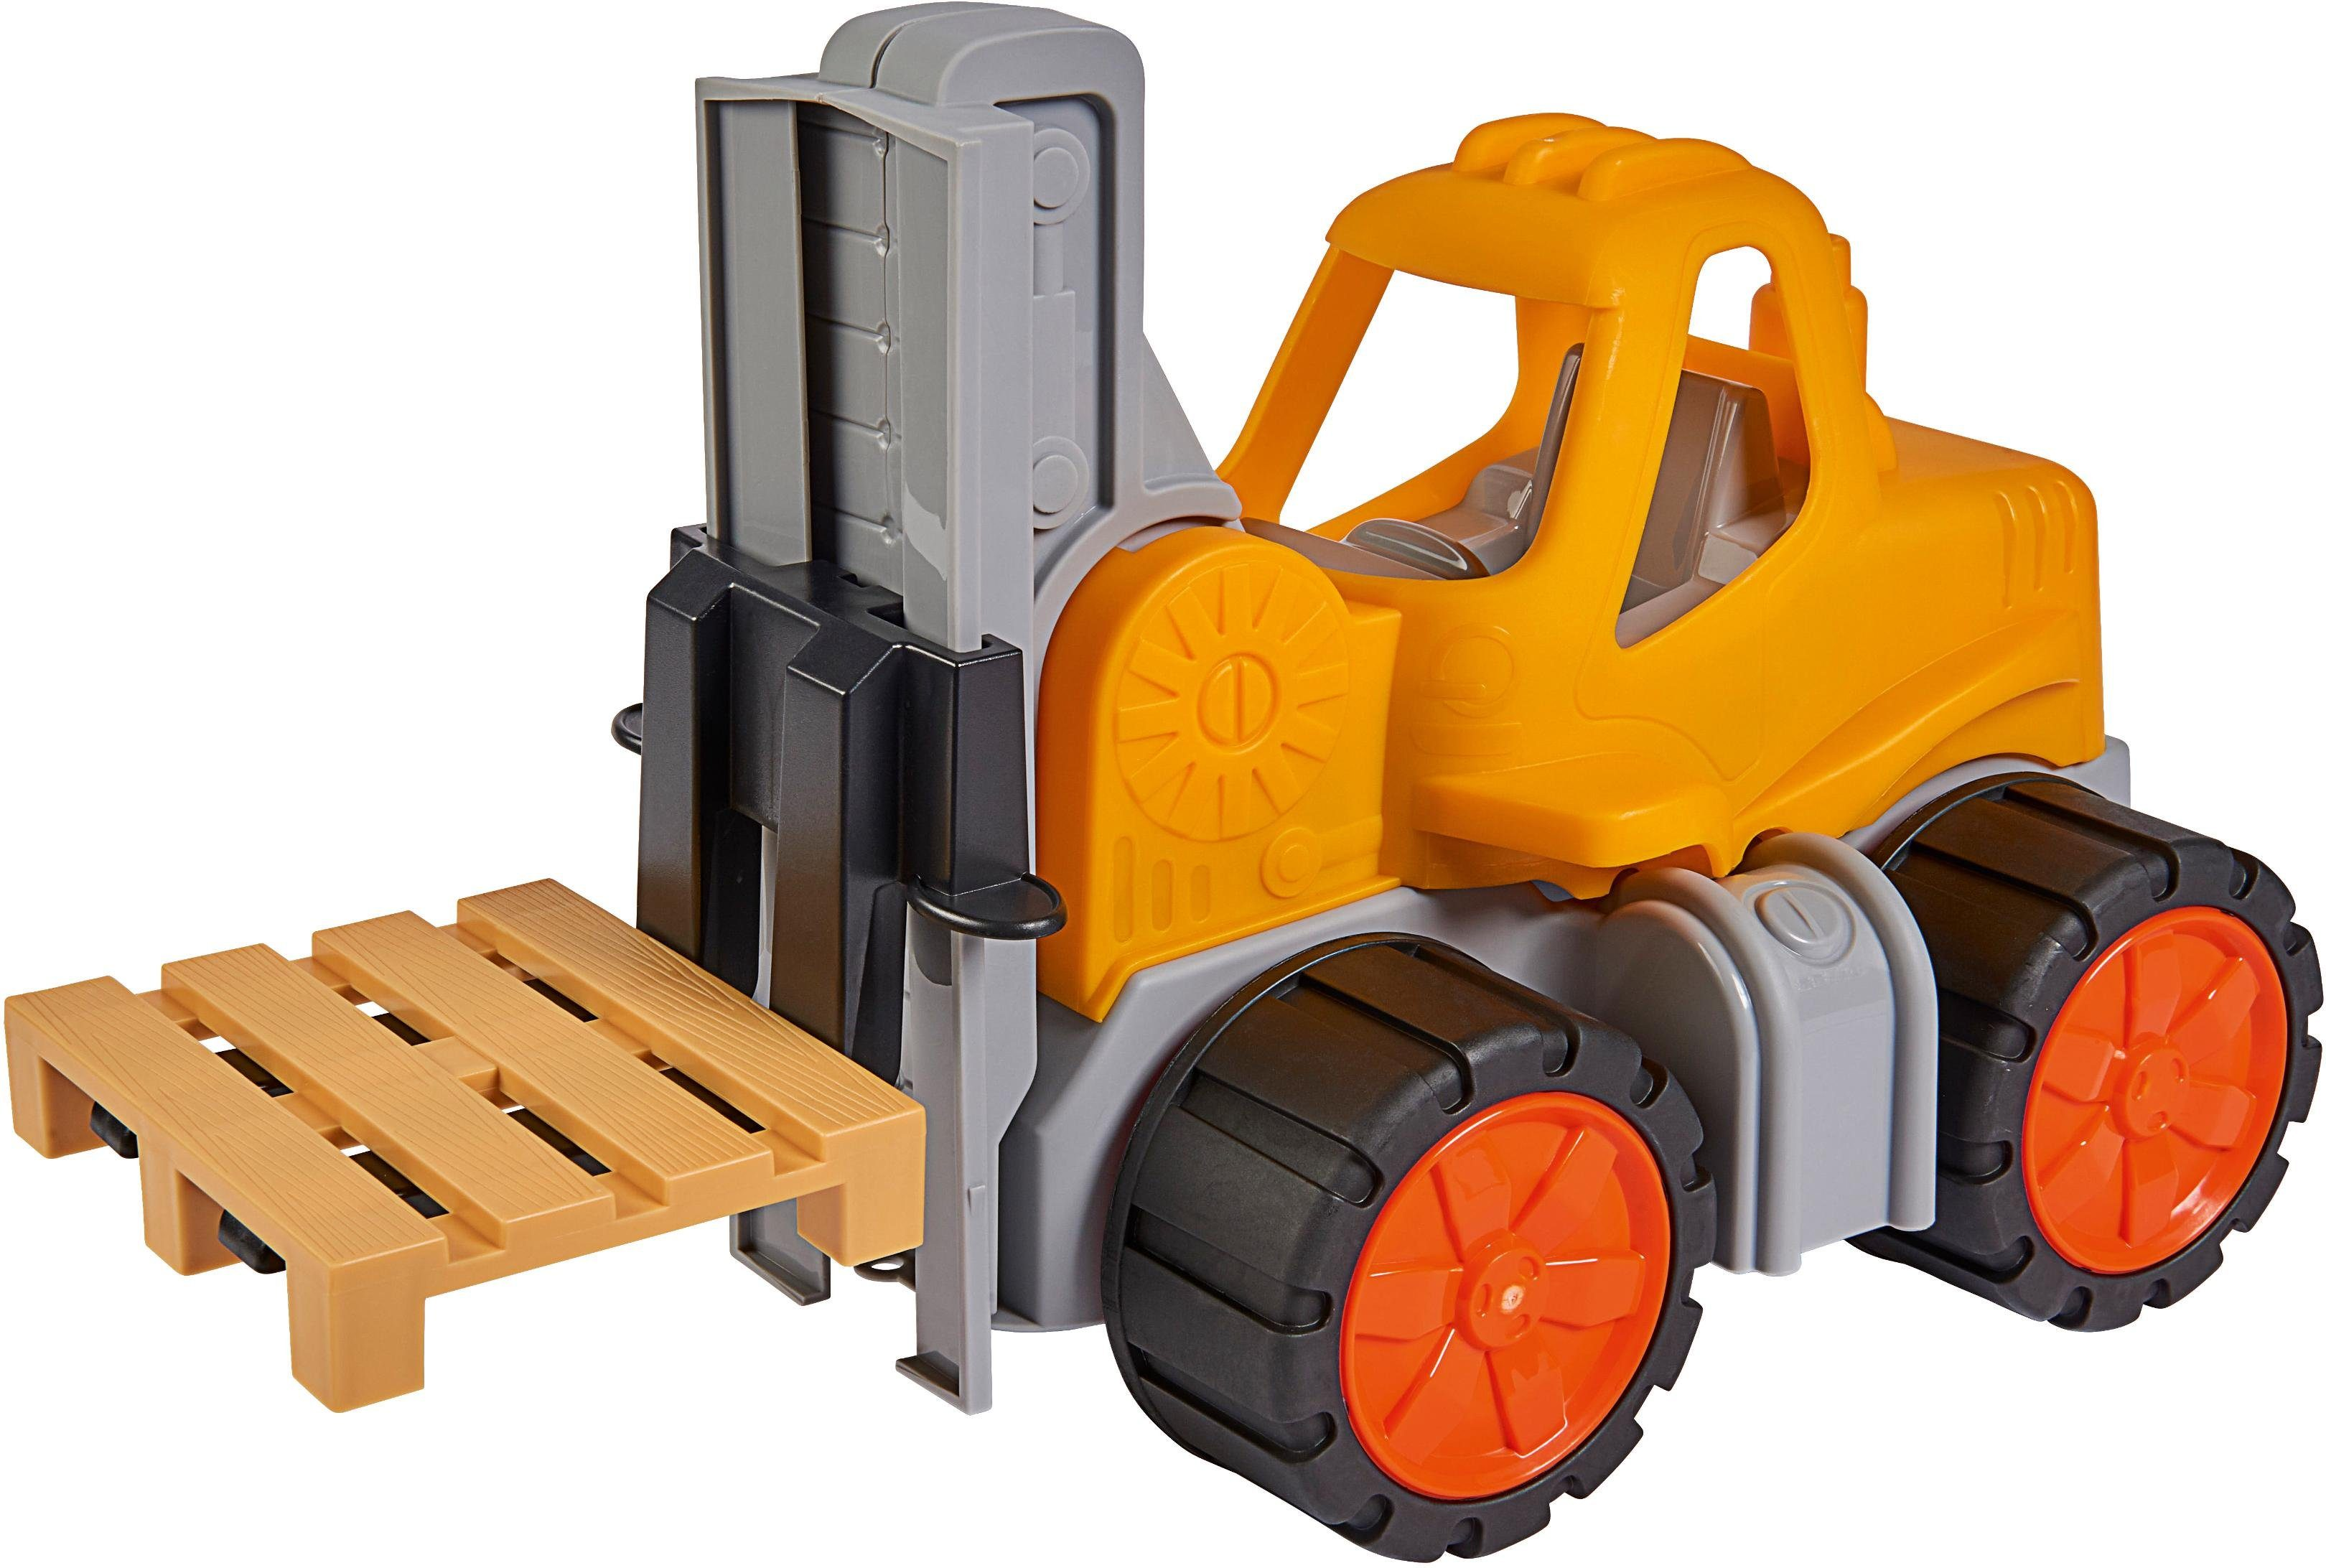 "BIG Spielzeug-Gabelstapler ""BIG Power Worker Gabelstapler"" Kindermode/Spielzeug/Autos, Eisenbahn & Modellbau/Spielzeugautos/Weitere Spielzeugautos"